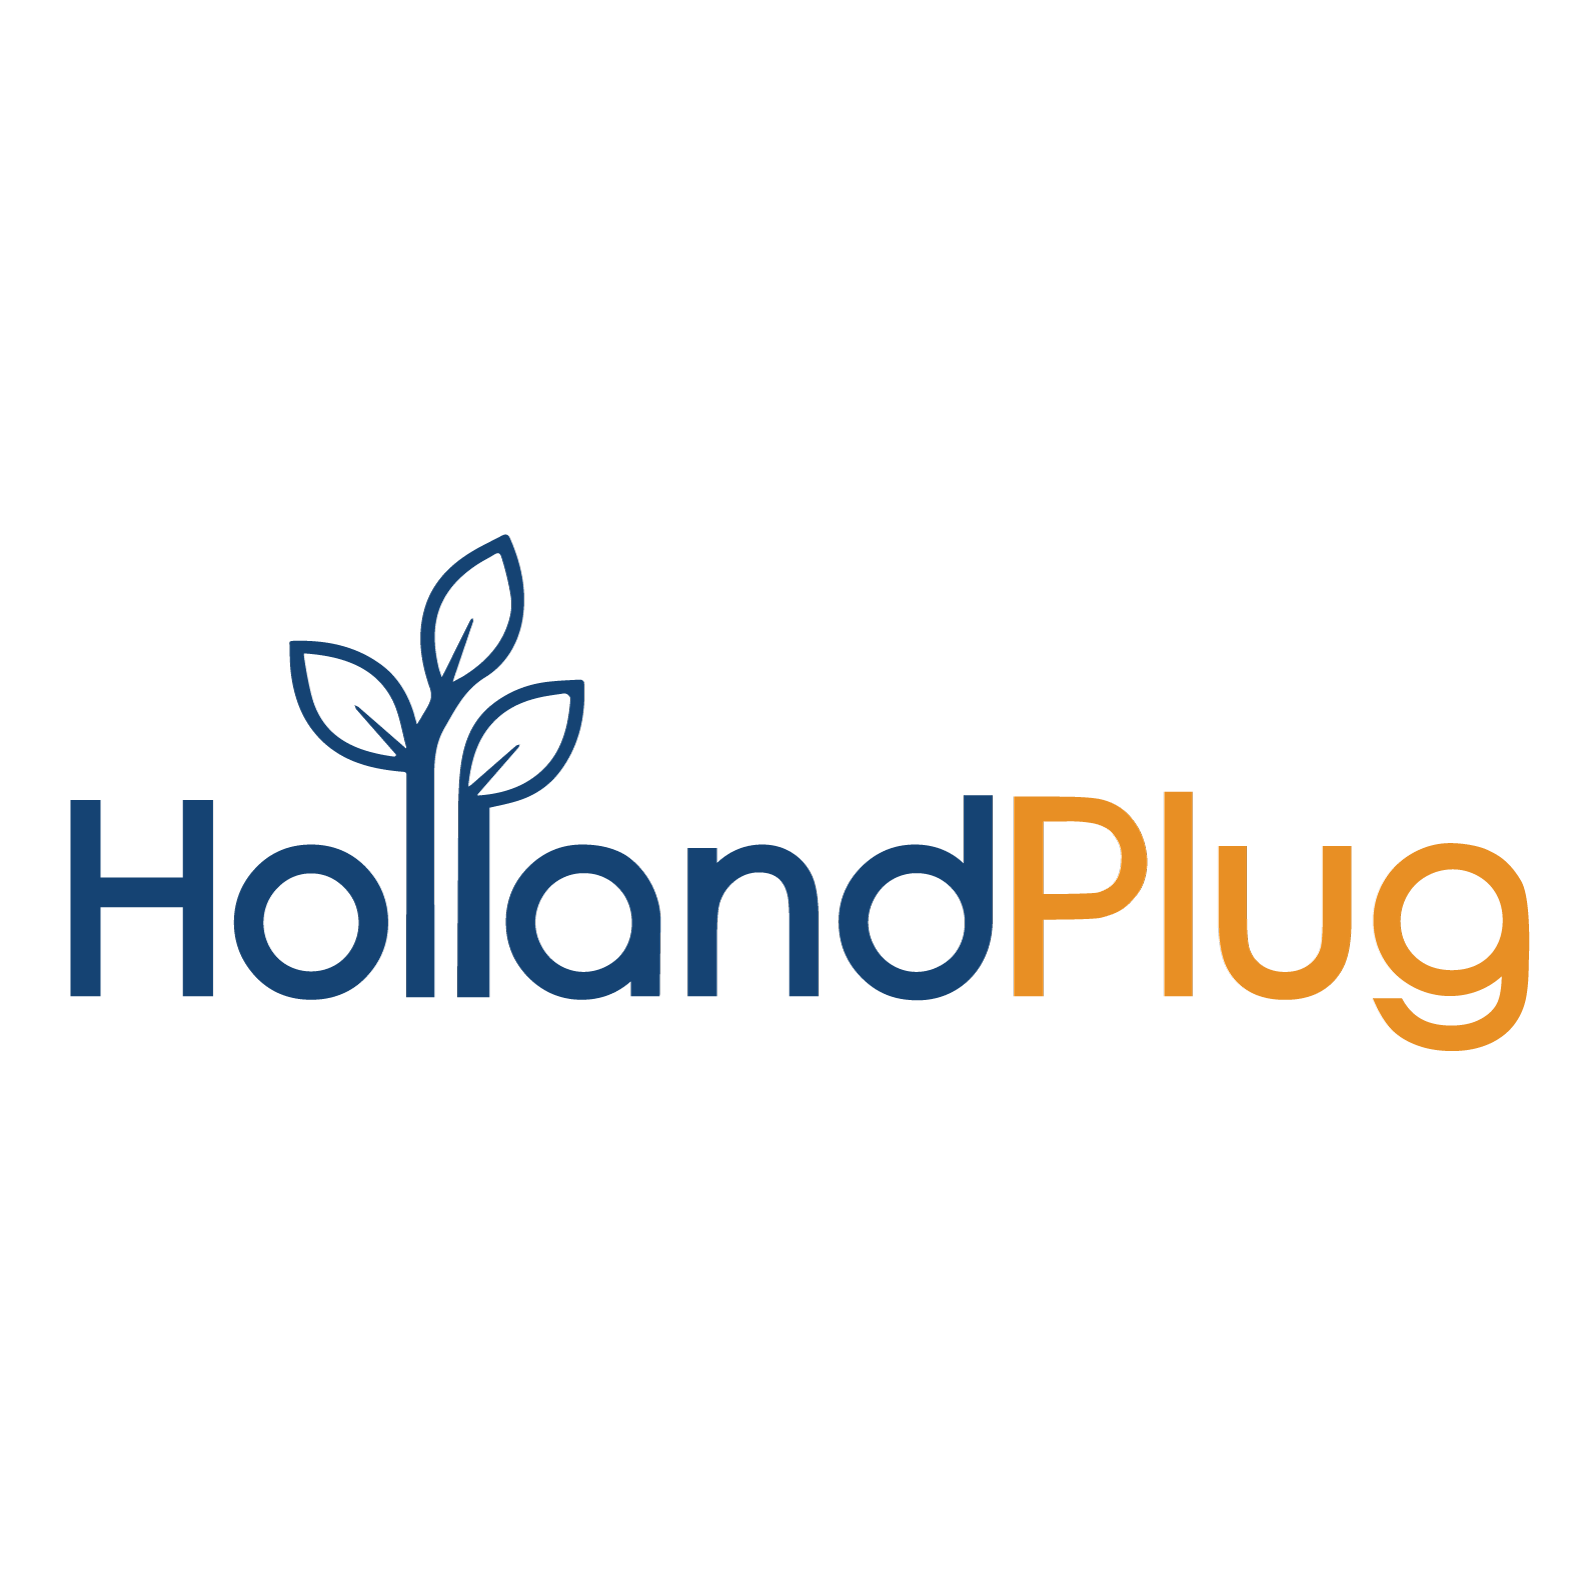 square_Hollandplug_logo.png